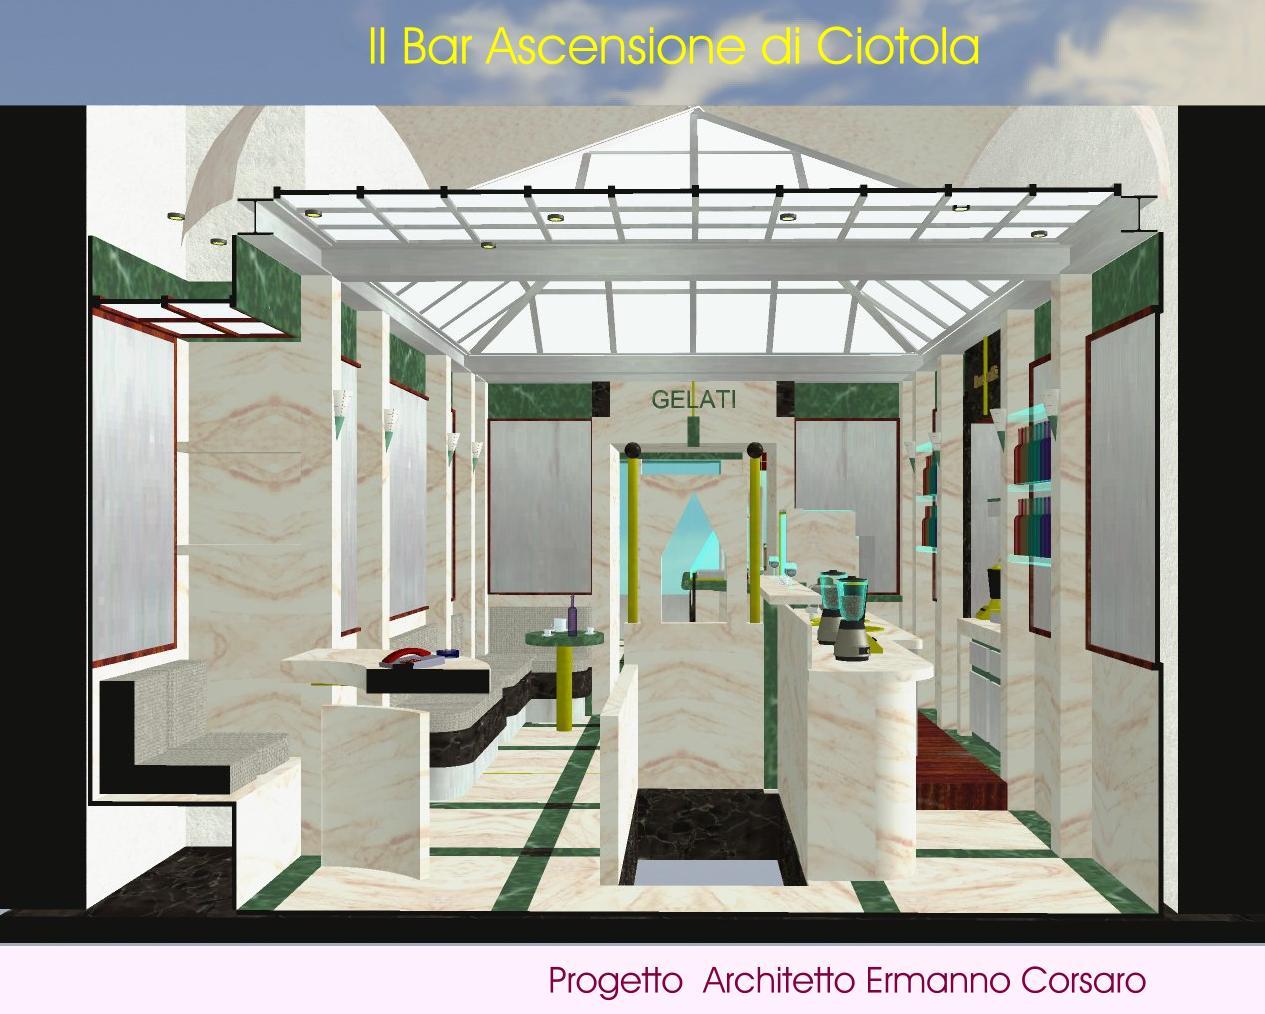 Architettura italiana 1 for Architettura italiana